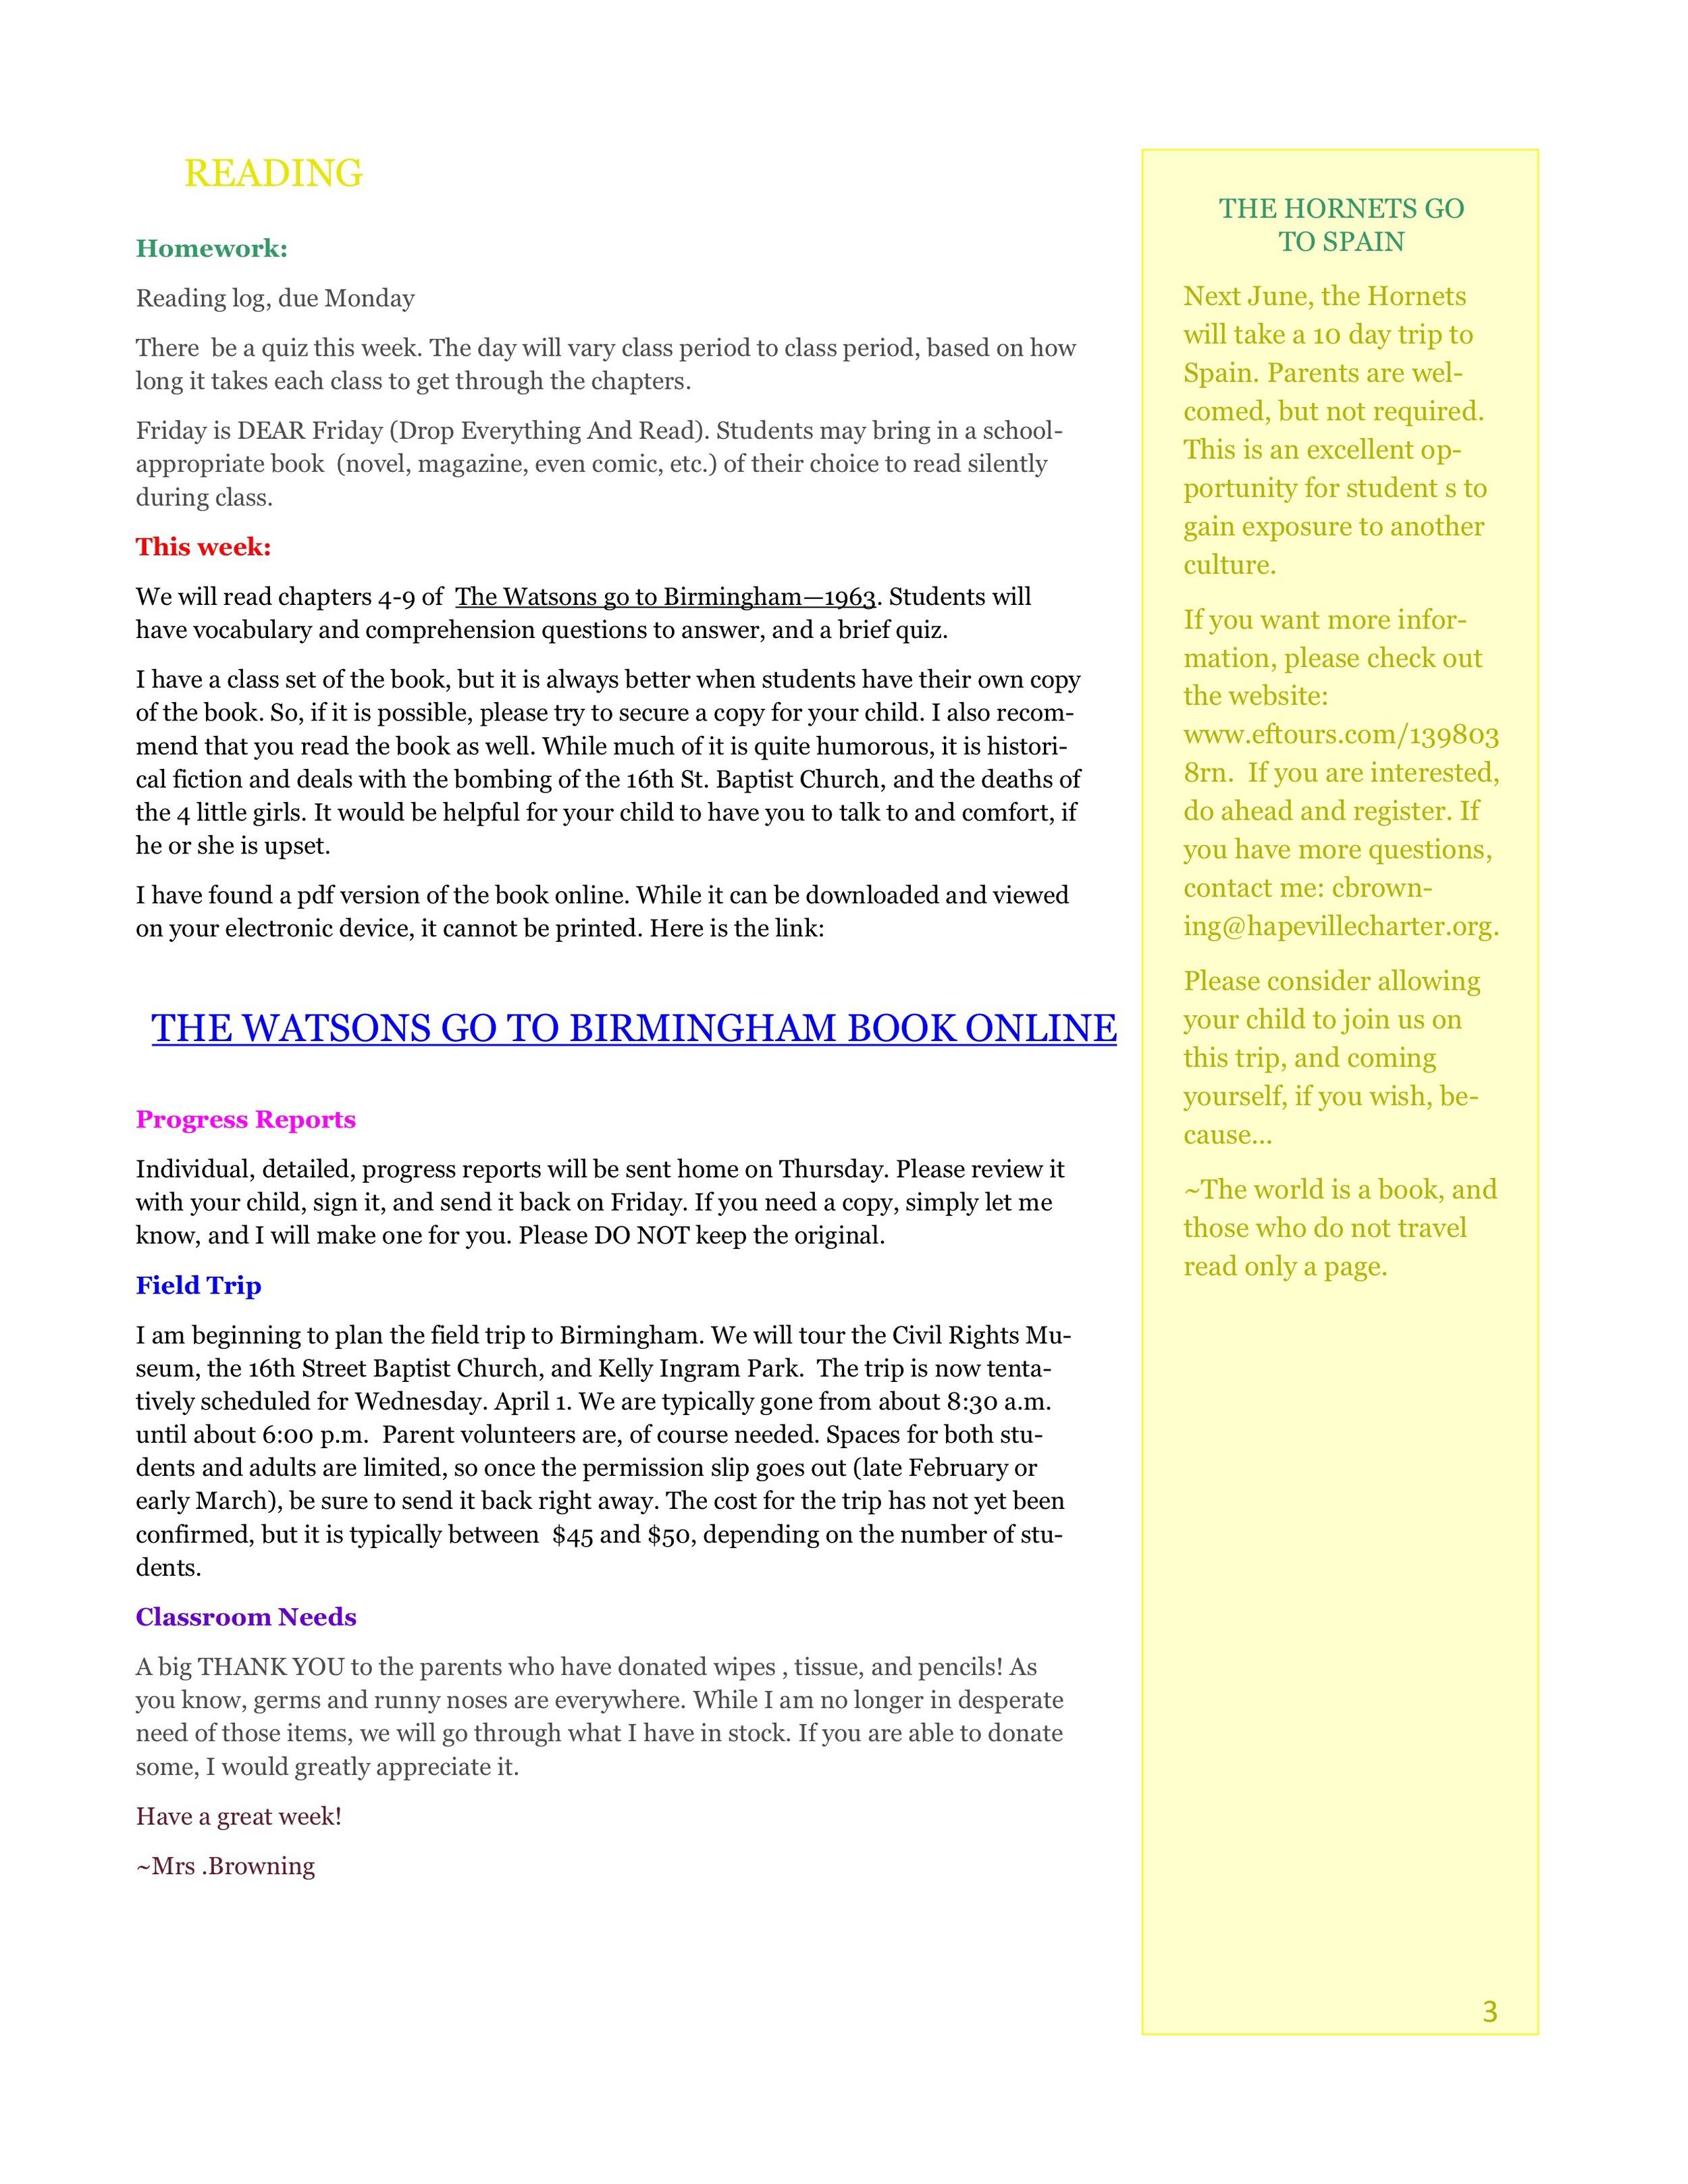 Newsletter Image6th grade January 26-30 3.jpeg